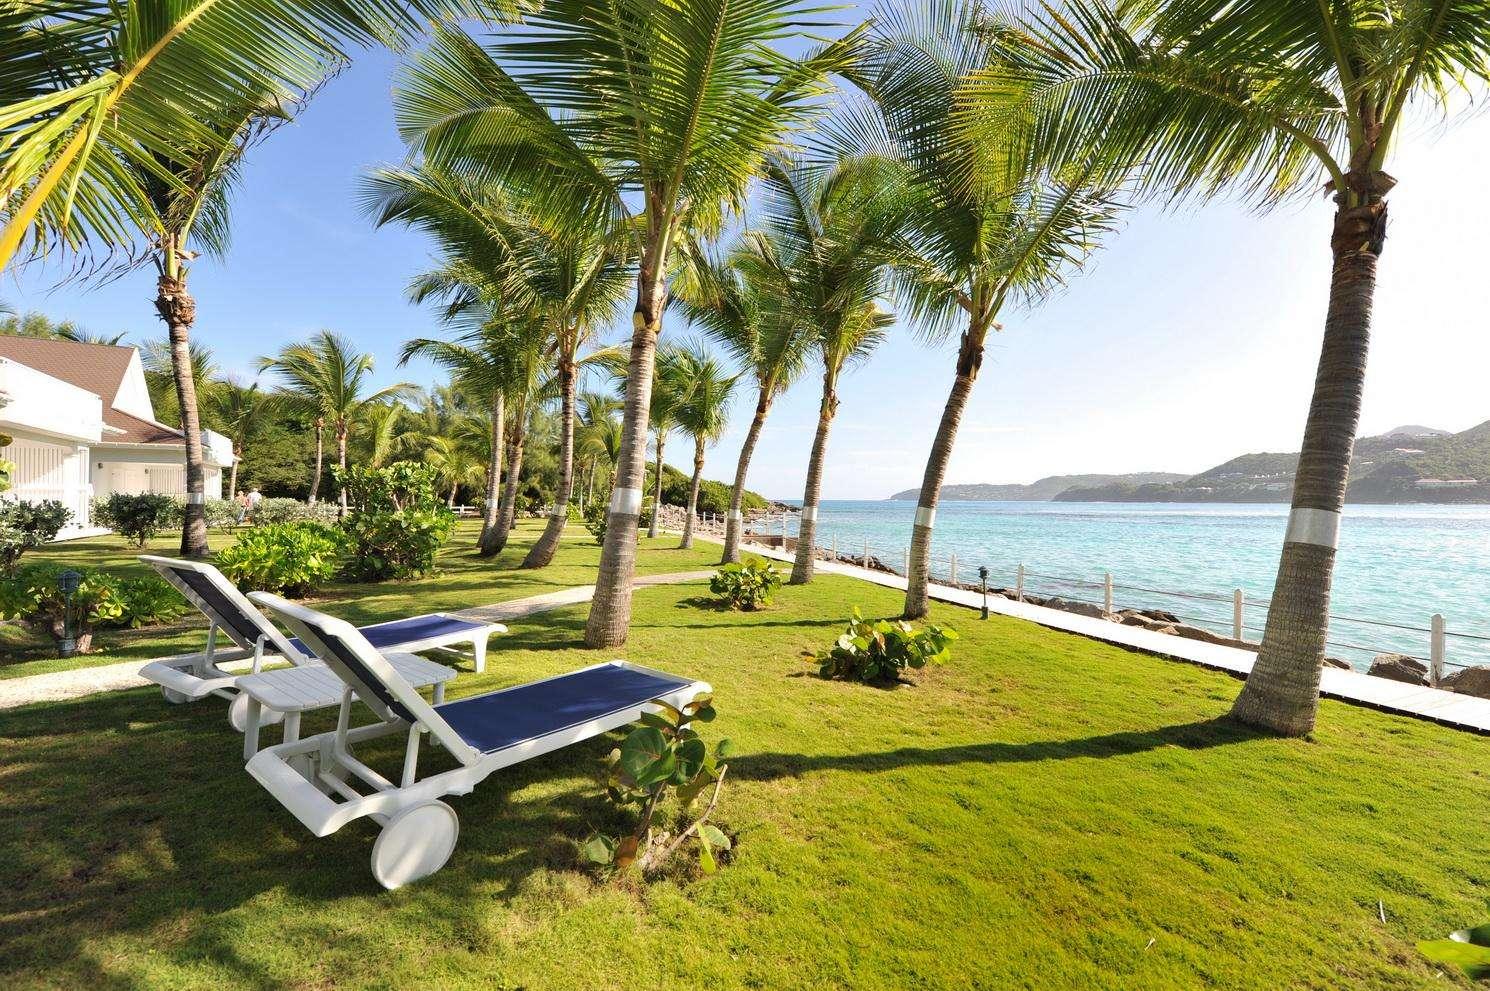 Luxury villa rentals caribbean - St barthelemy - Saint jean - Cap Fréhel - Image 1/20